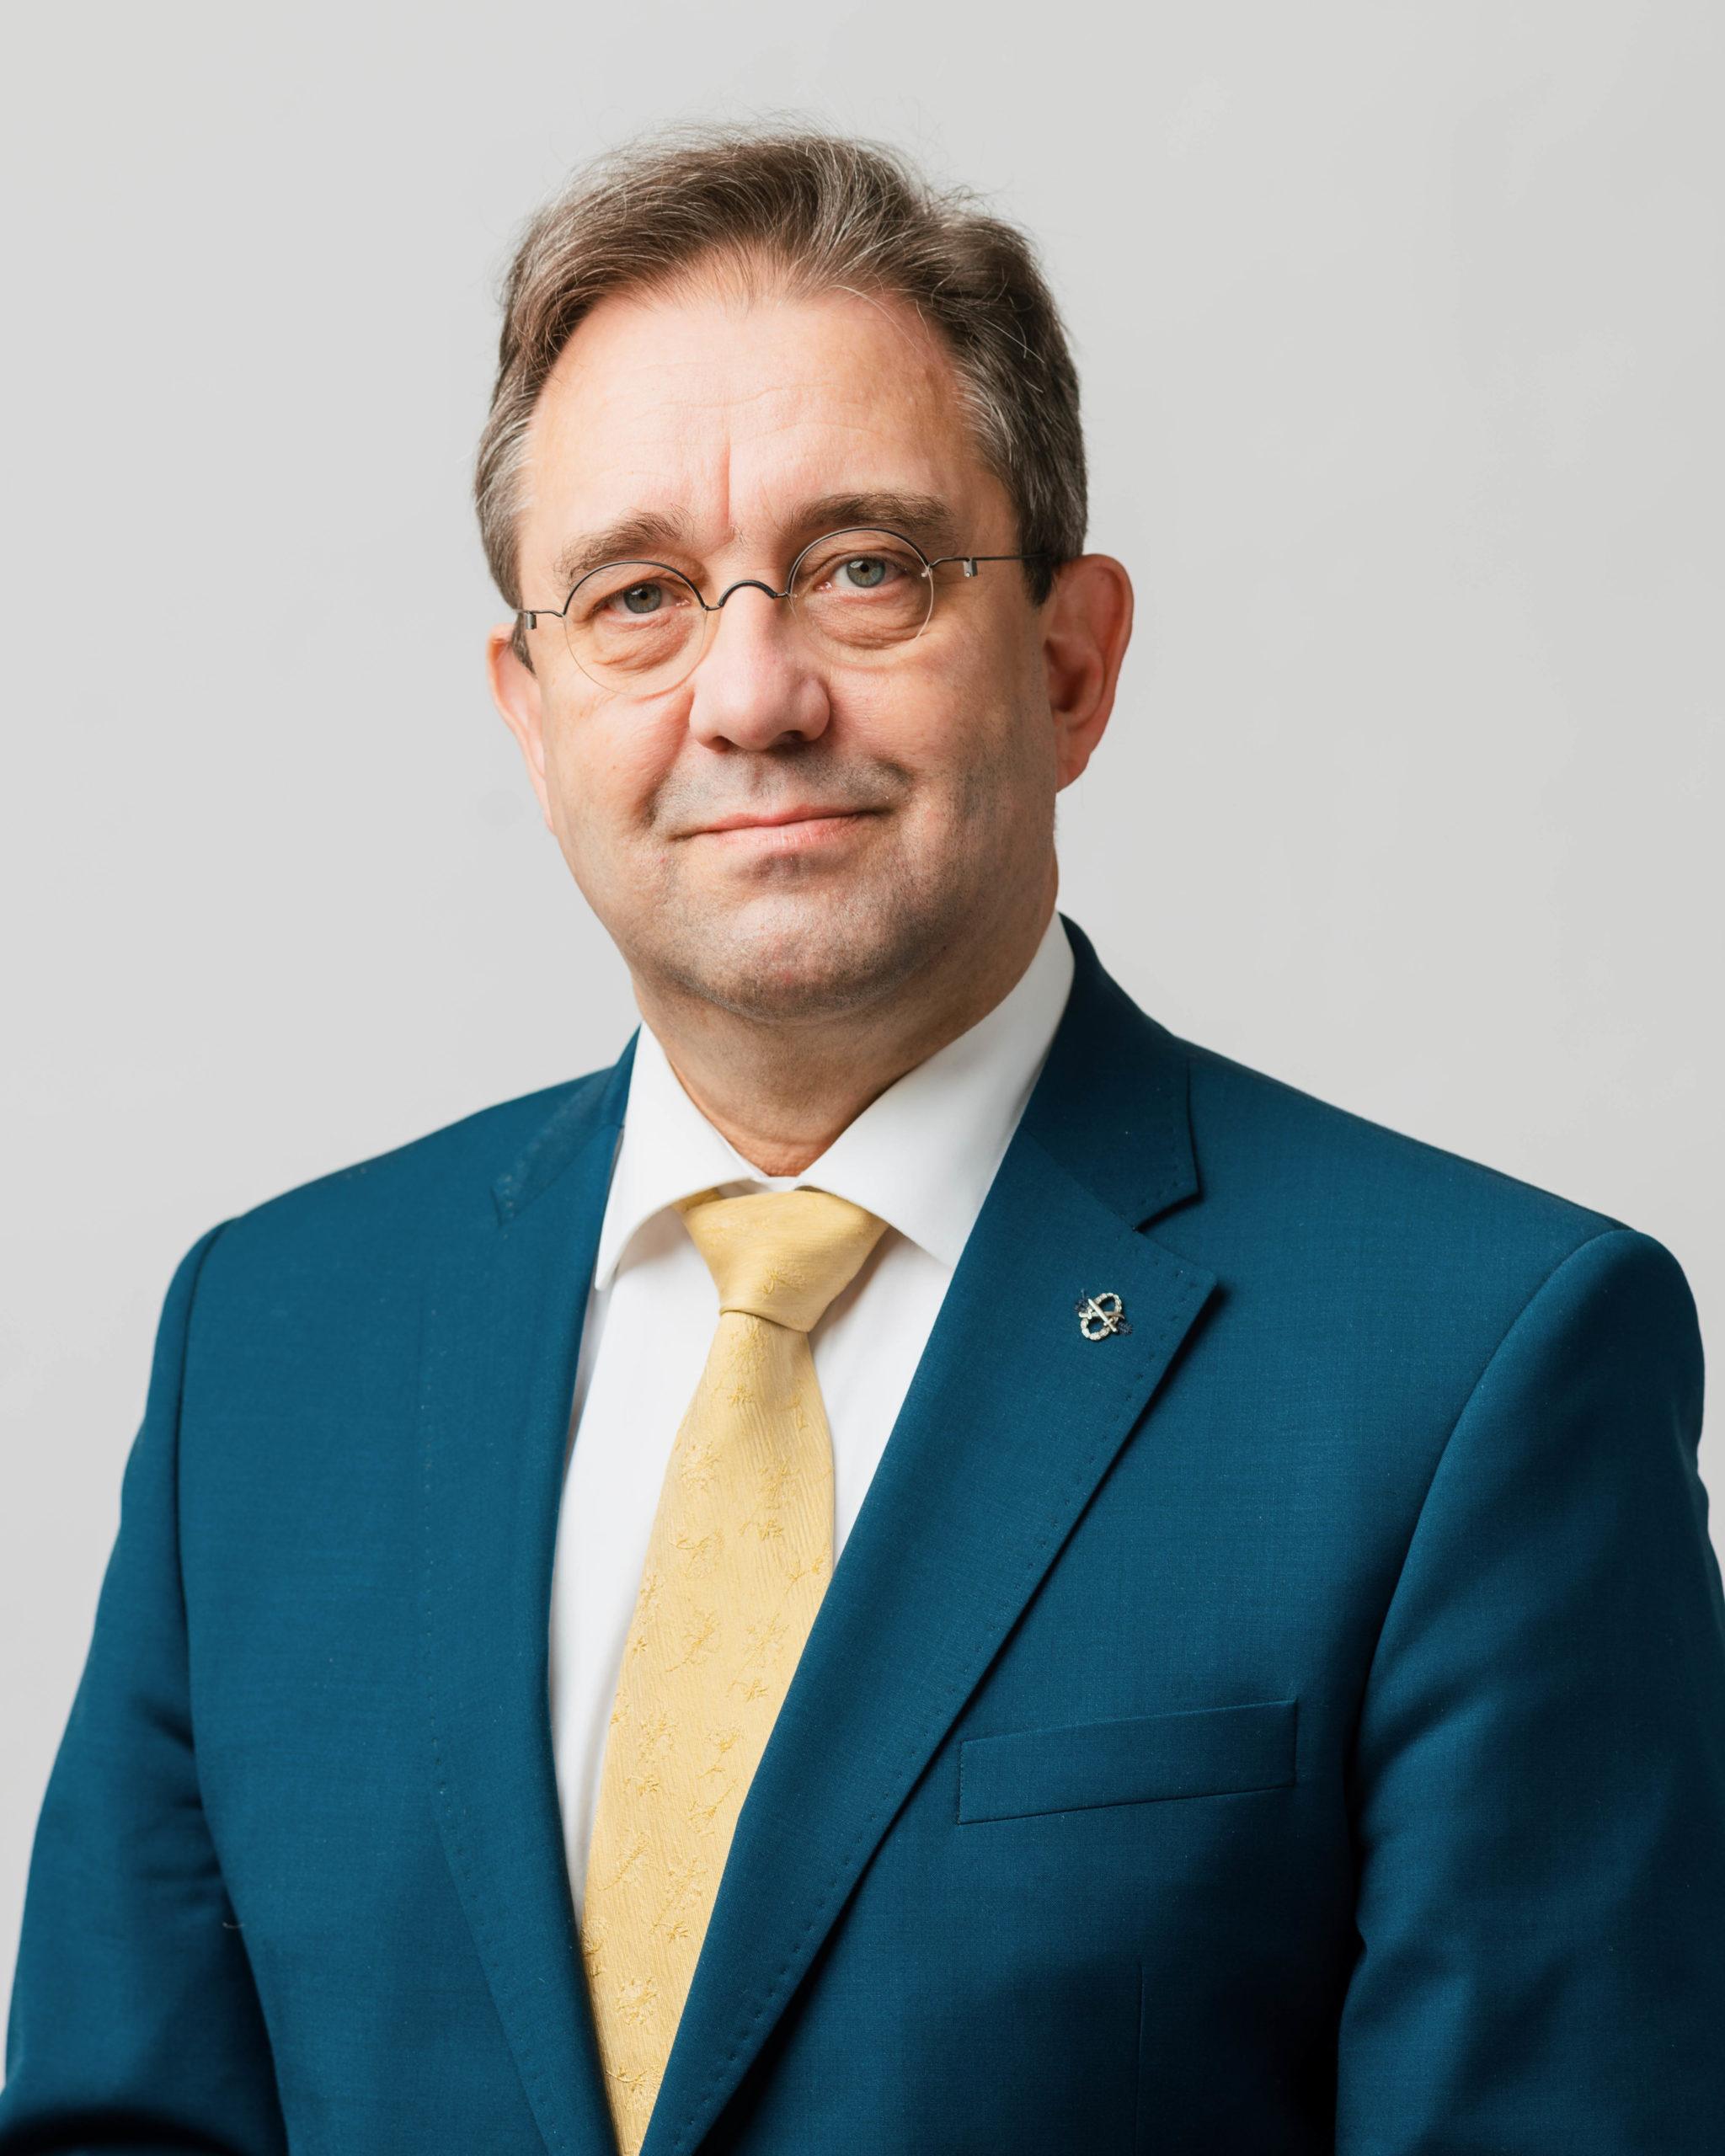 Veli-Pekka Nurmi